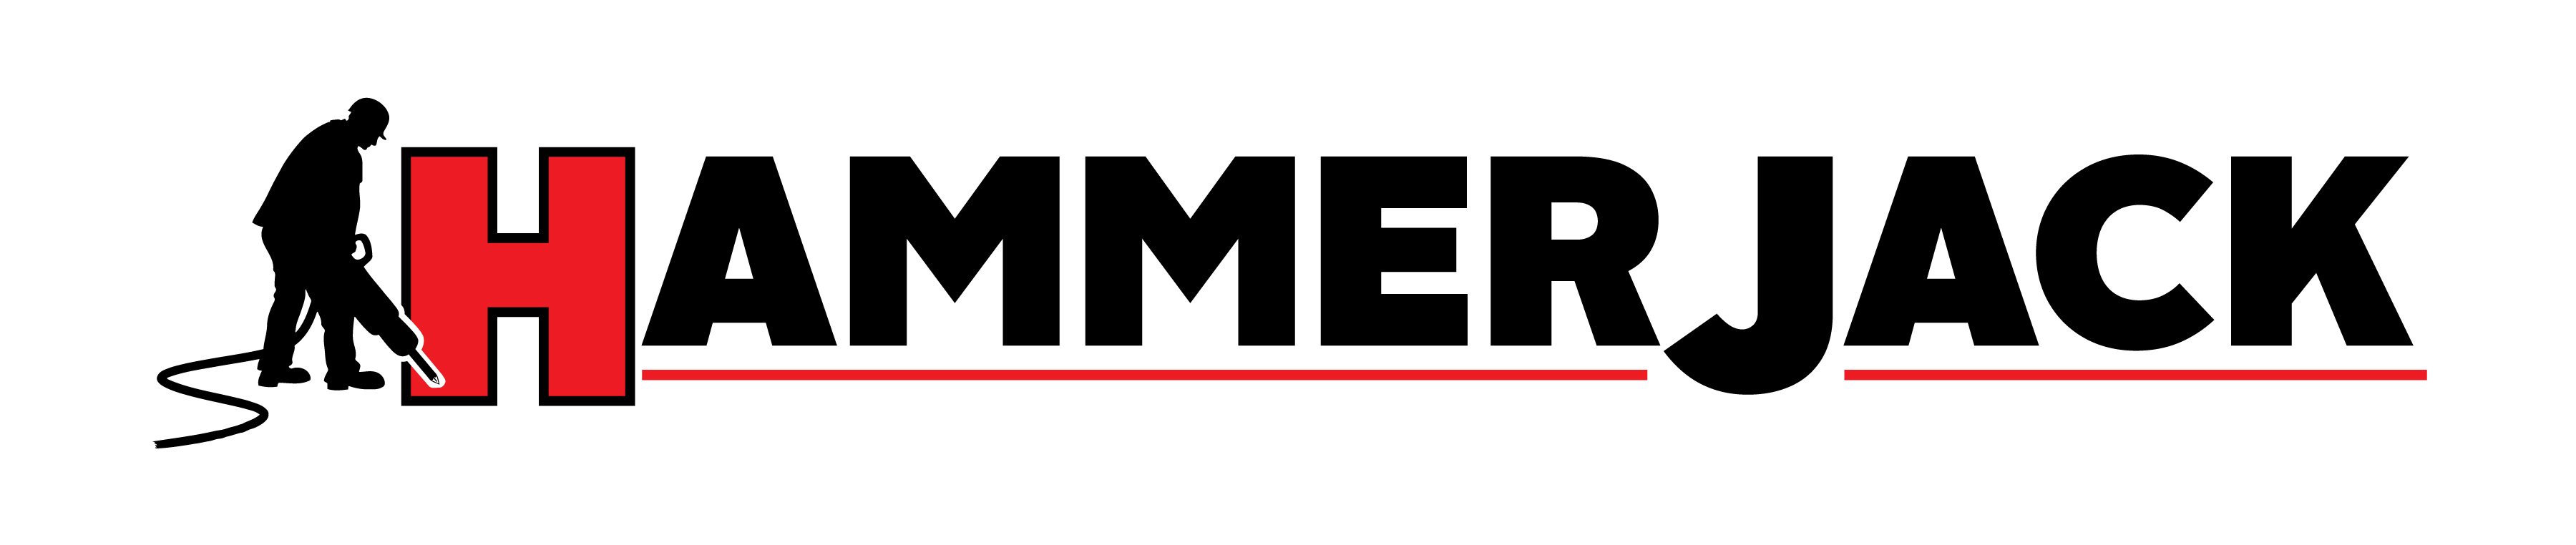 Hammerjack Limited Logo